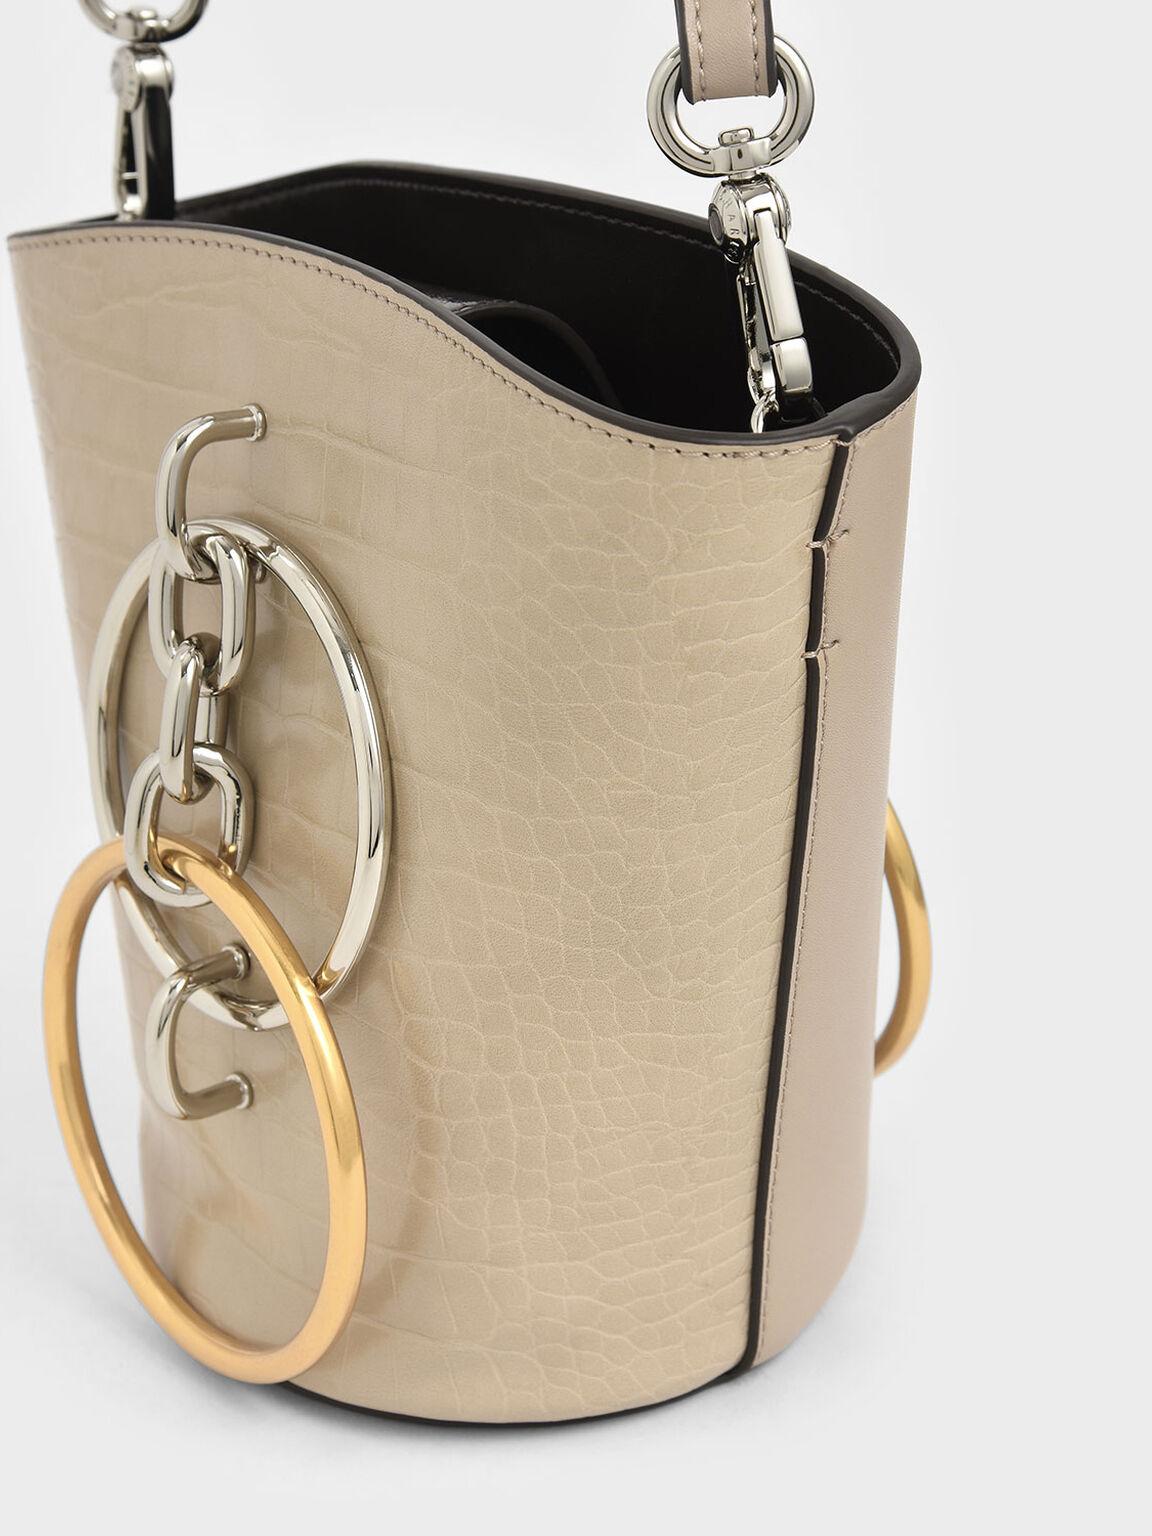 Croc-Effect Bracelet Bucket Bag, Beige, hi-res